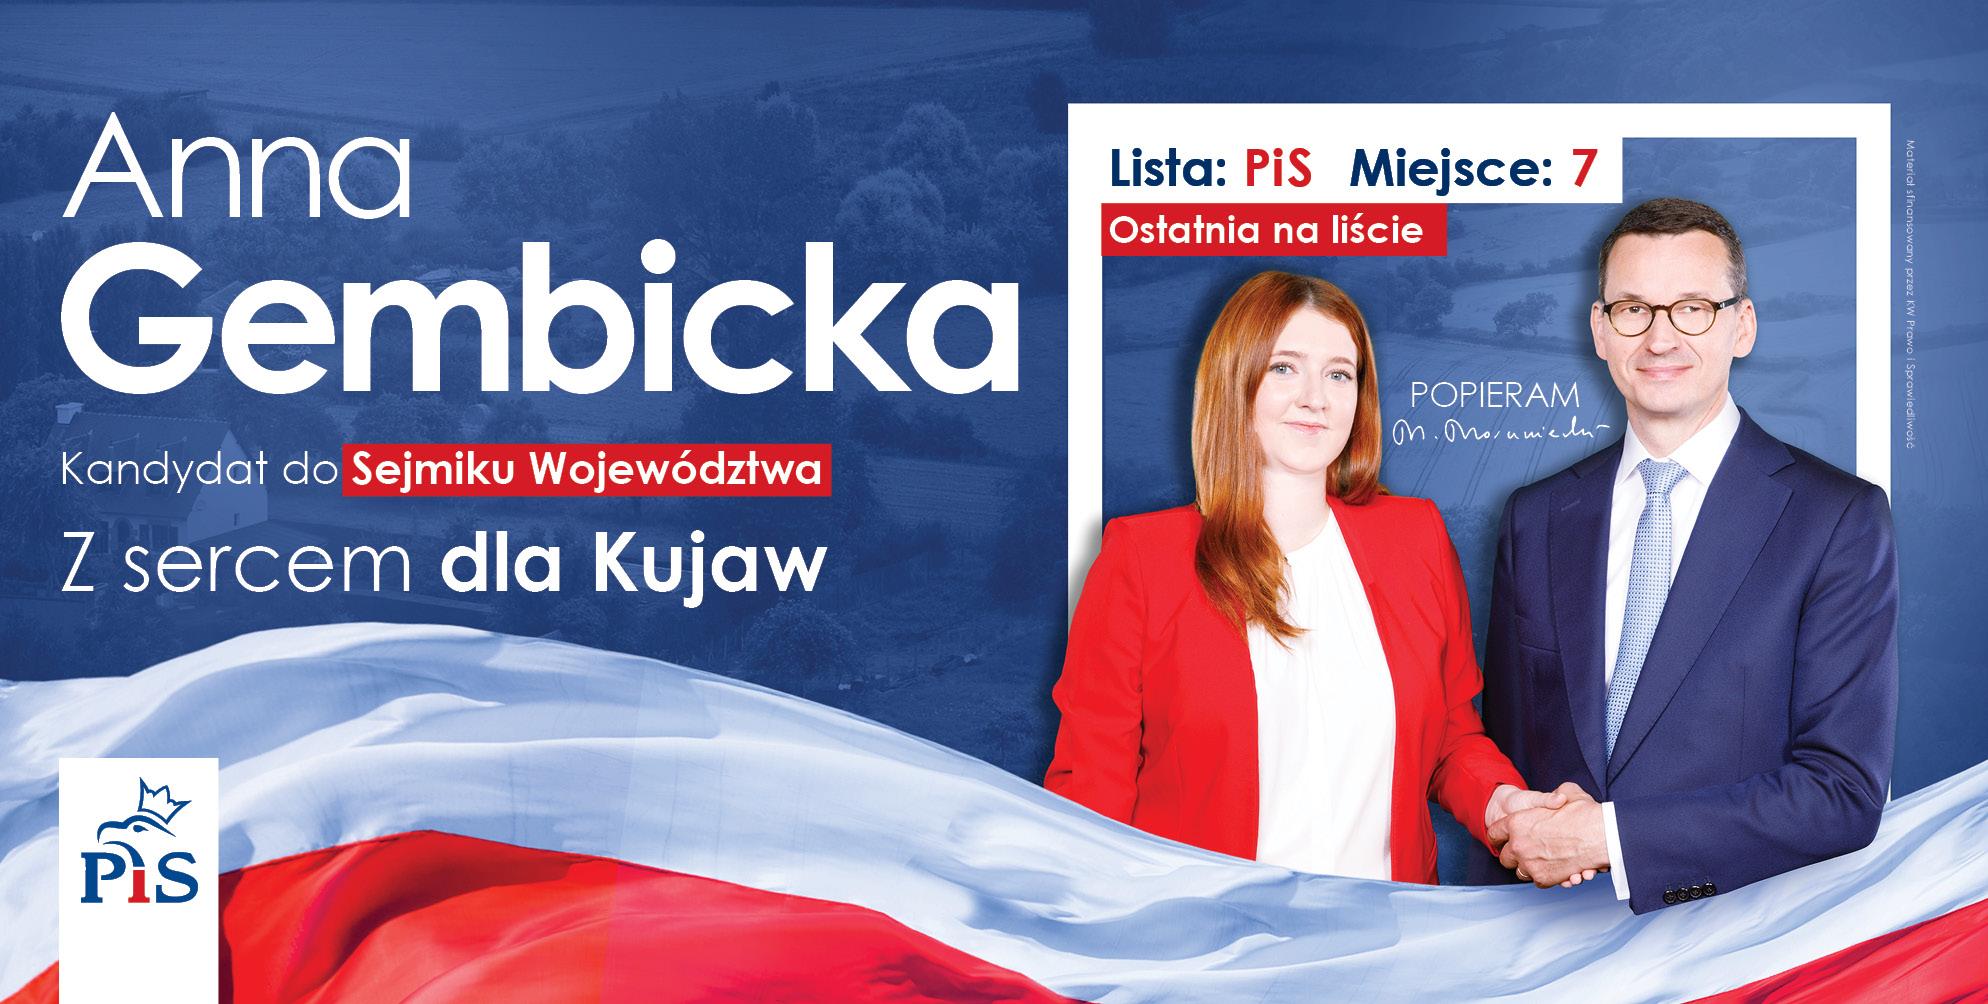 Gembicka Anna